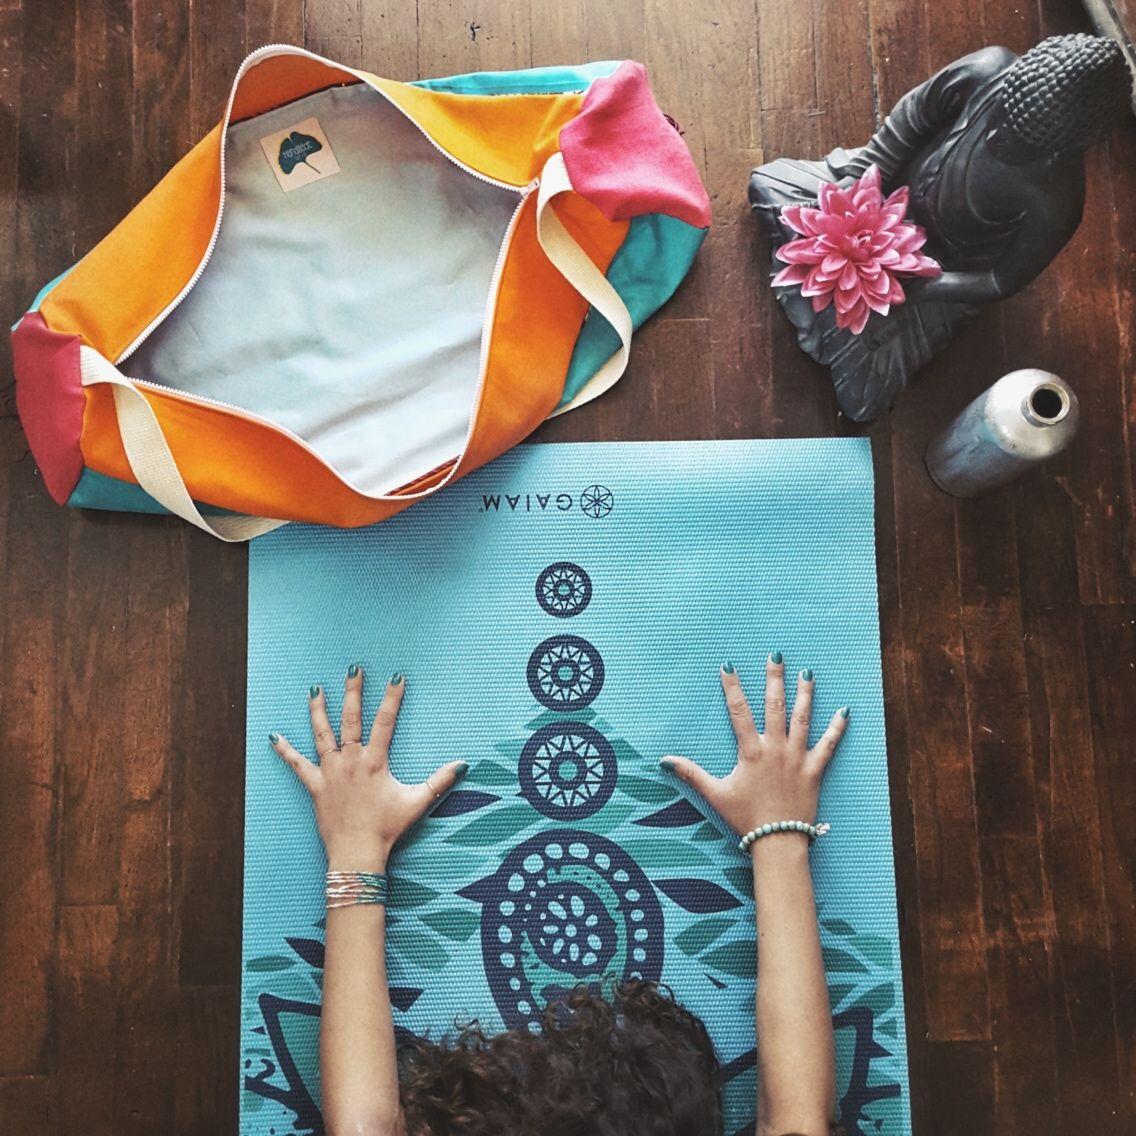 b91cdc670455 Handmade color block yoga mat bag - Yoga Mat Carrier - Manduka Mat - Gaiam  Mat - Prana Mat - Lululemon Mat